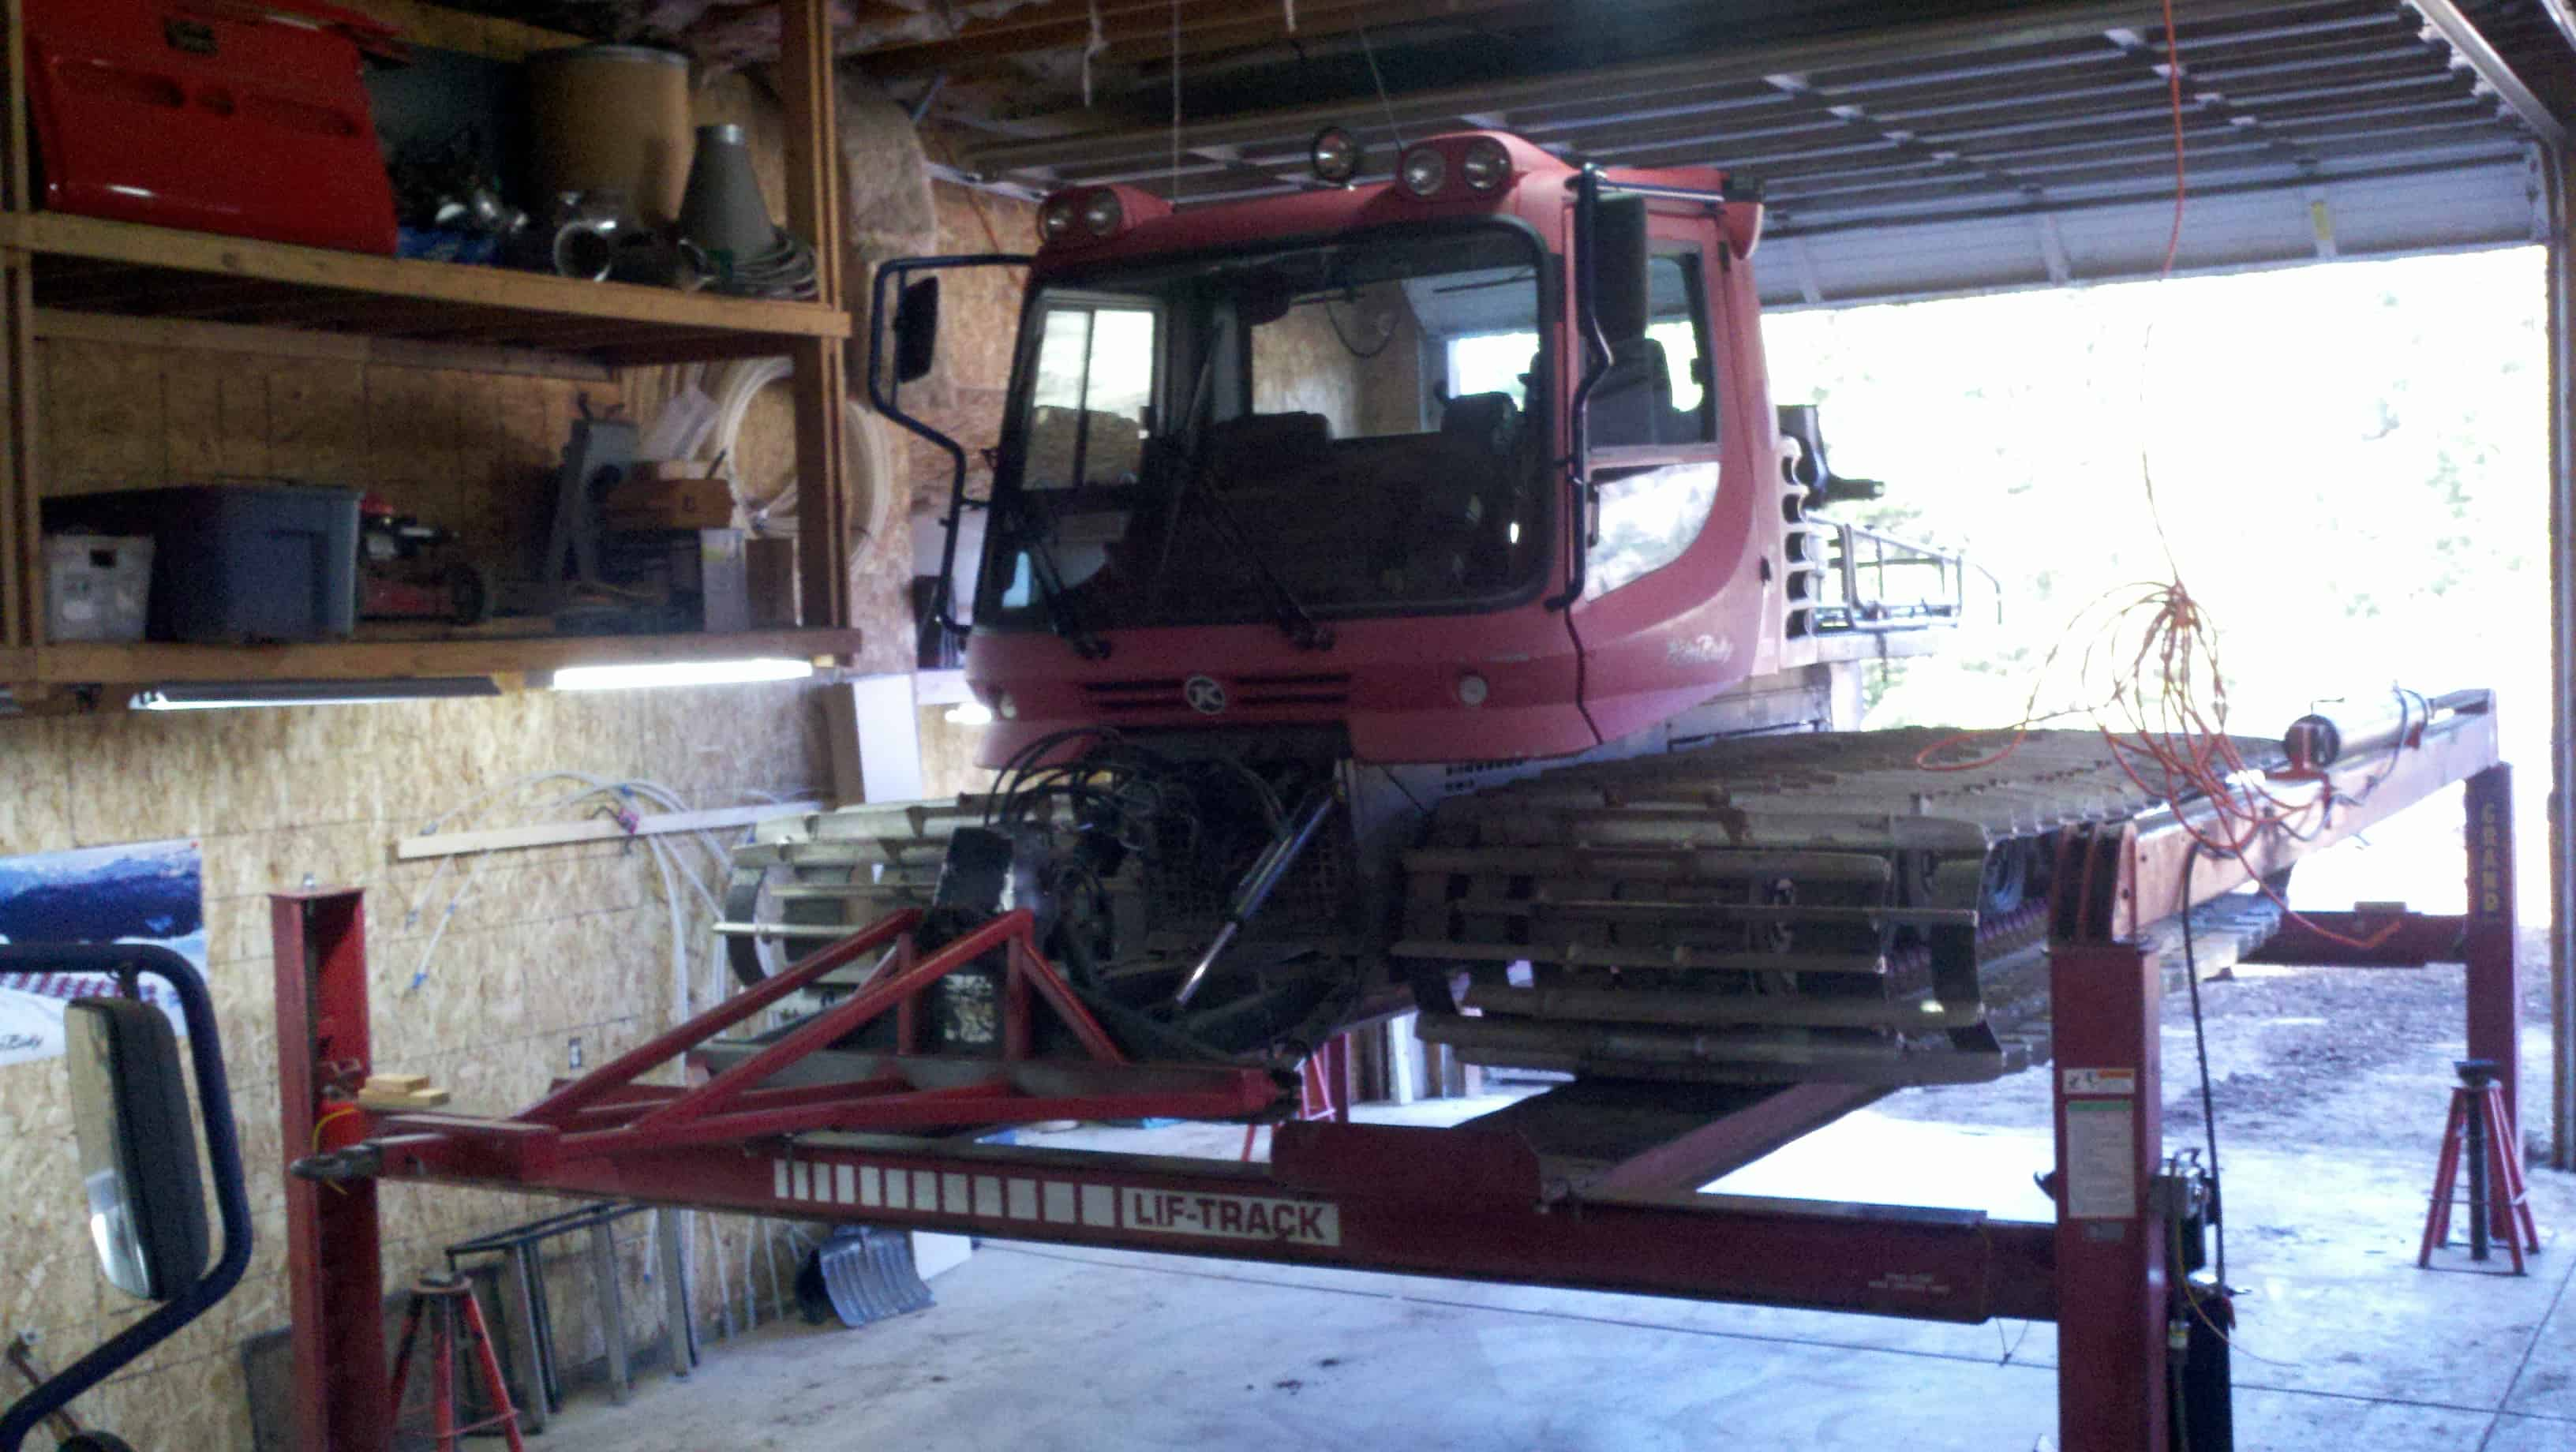 LIF-TRACK snowcat lift